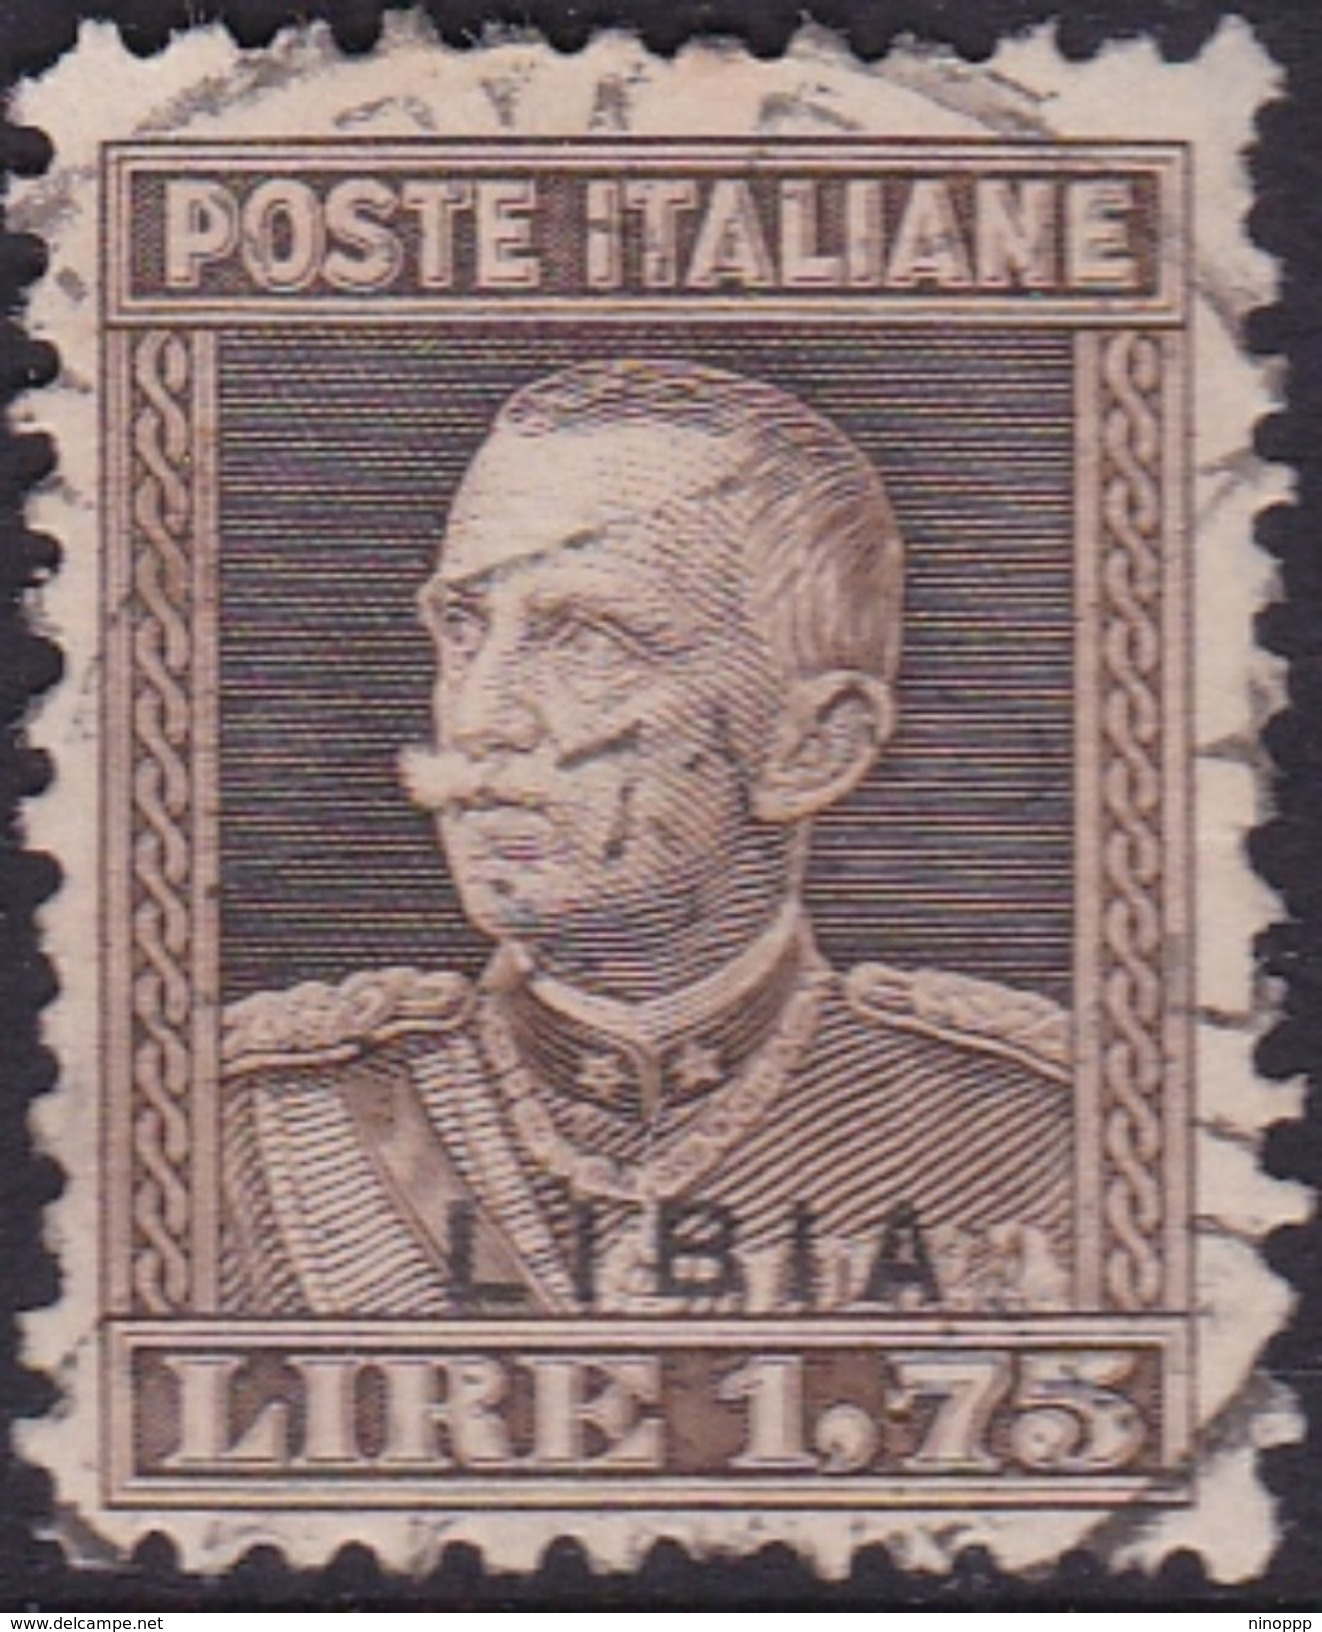 Italy-Colonies And Territories-Libya S 80 1929 King  V. Emanuele III,1,75 Lira Brown,used - Libya